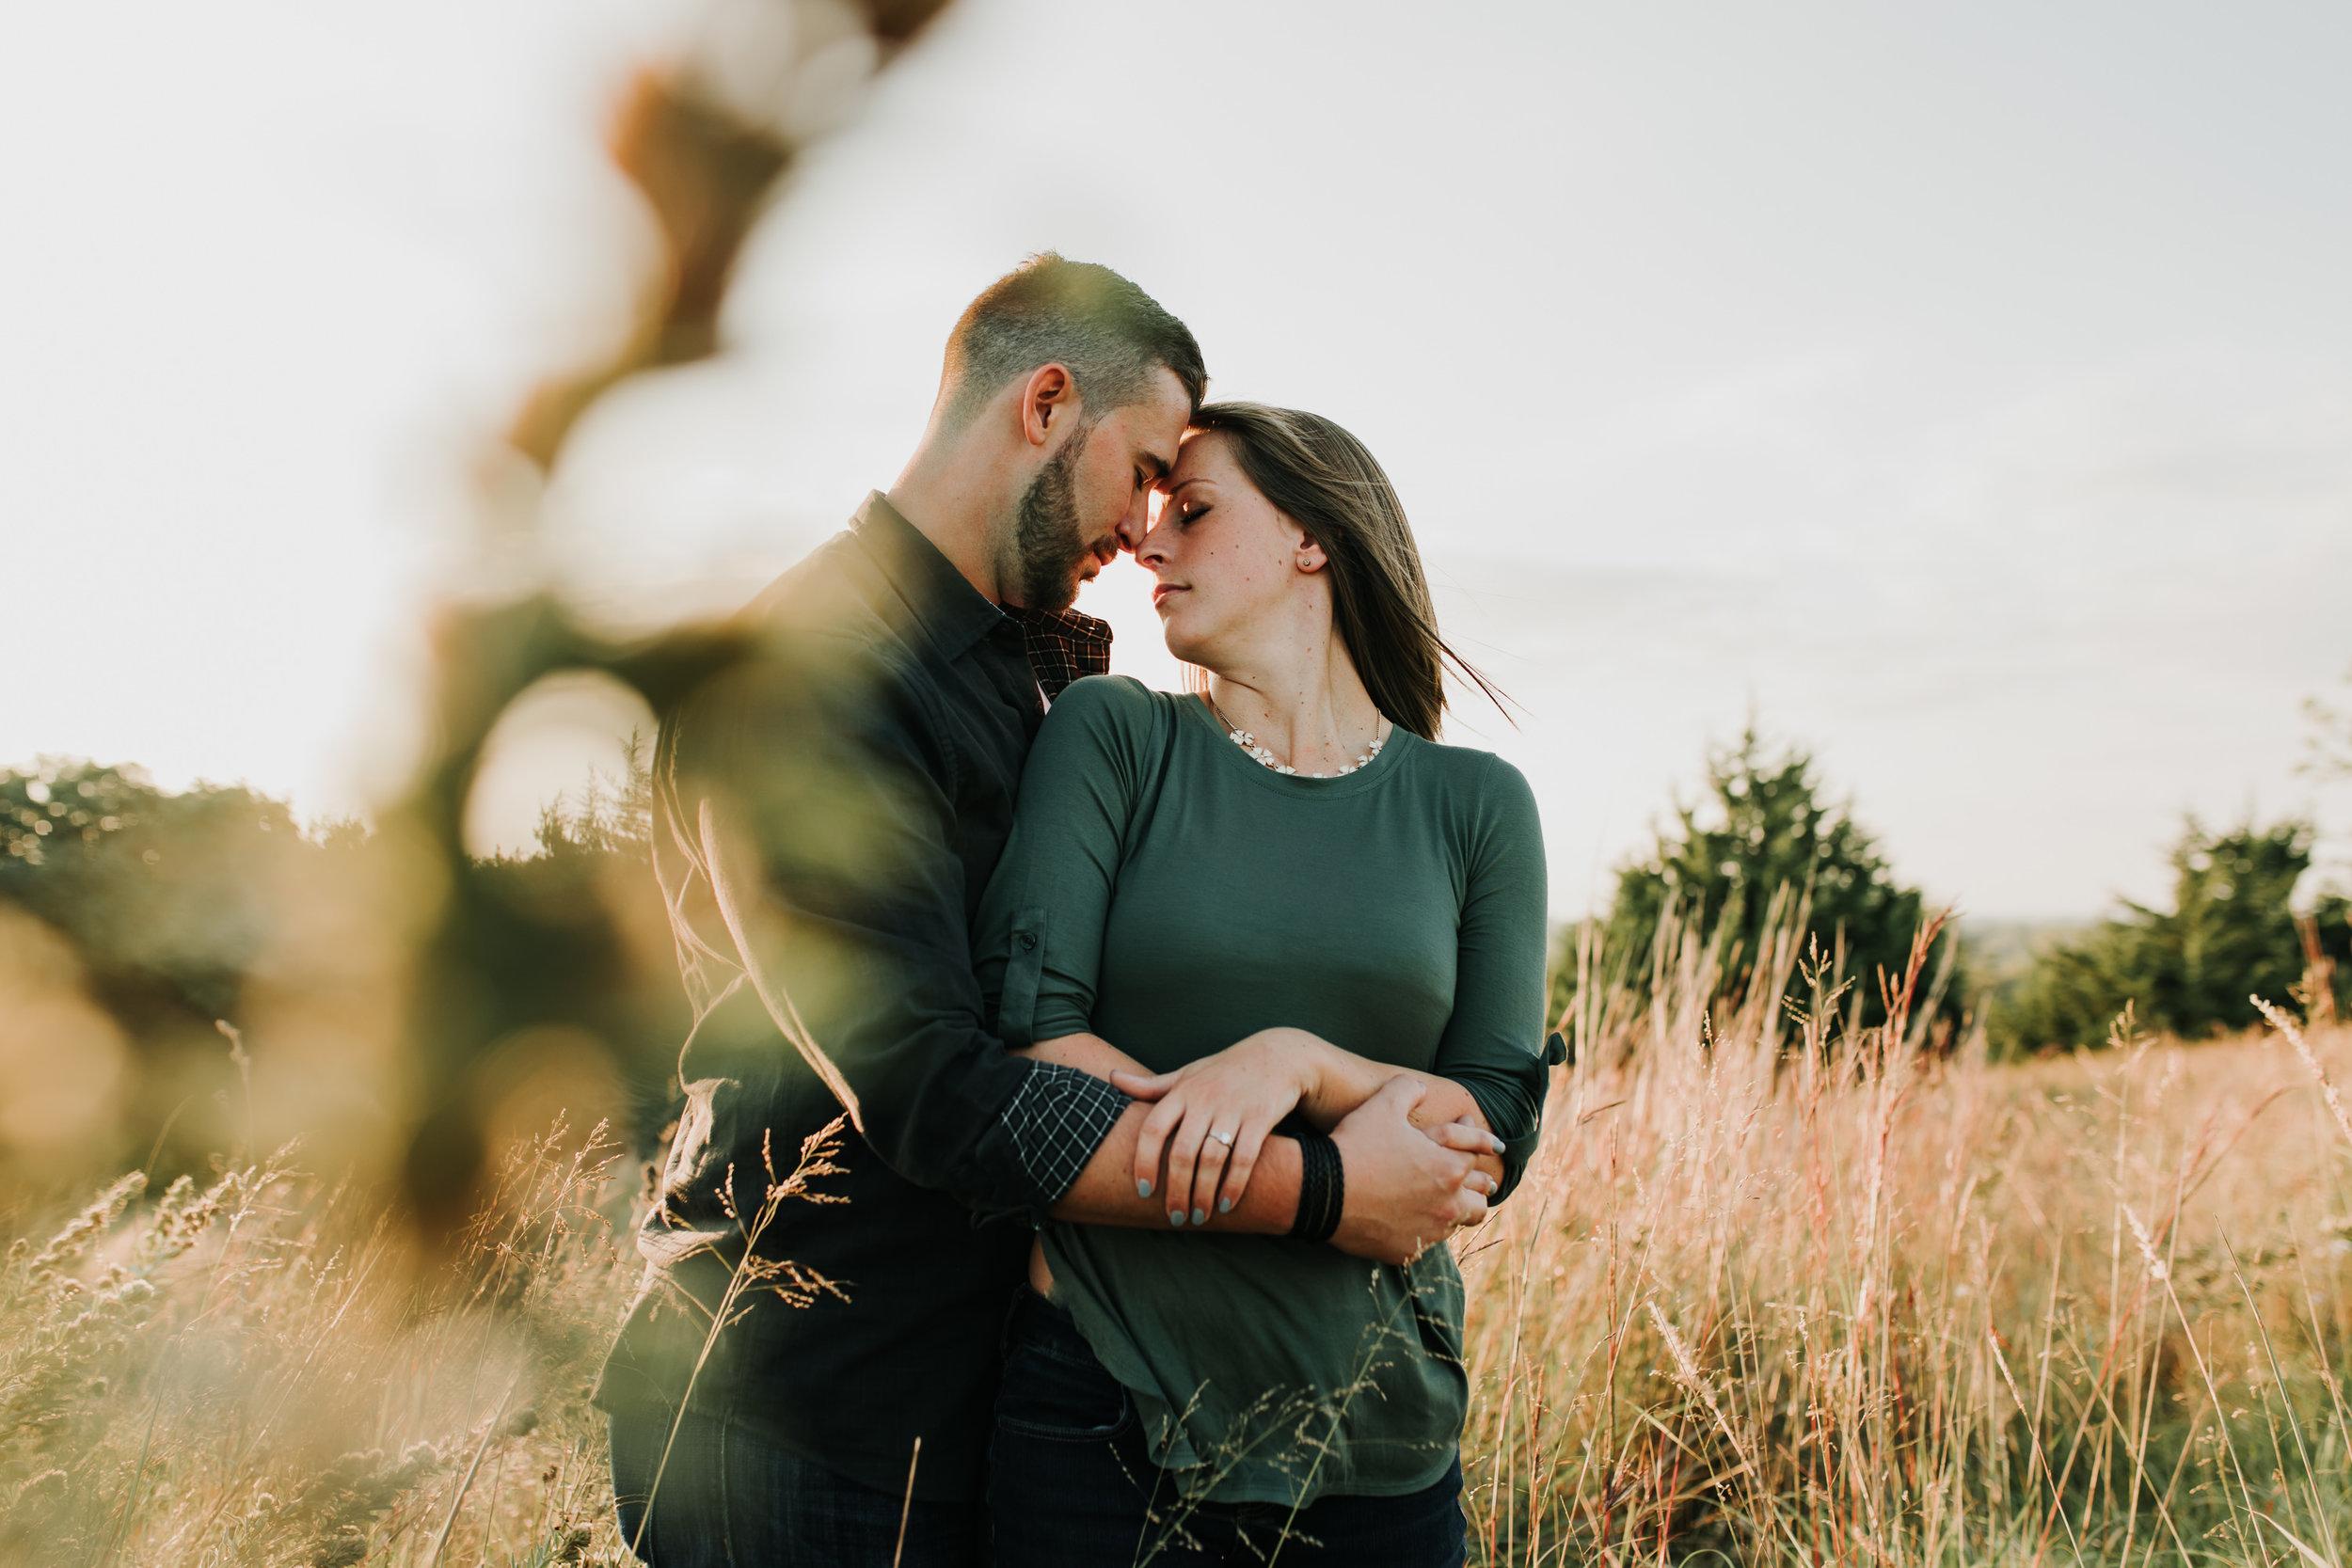 Leslie & Austin - Engaged - Nathaniel Jensen Photography - Omaha Nebraska Wedding Photograper - Engagement Session-67.jpg